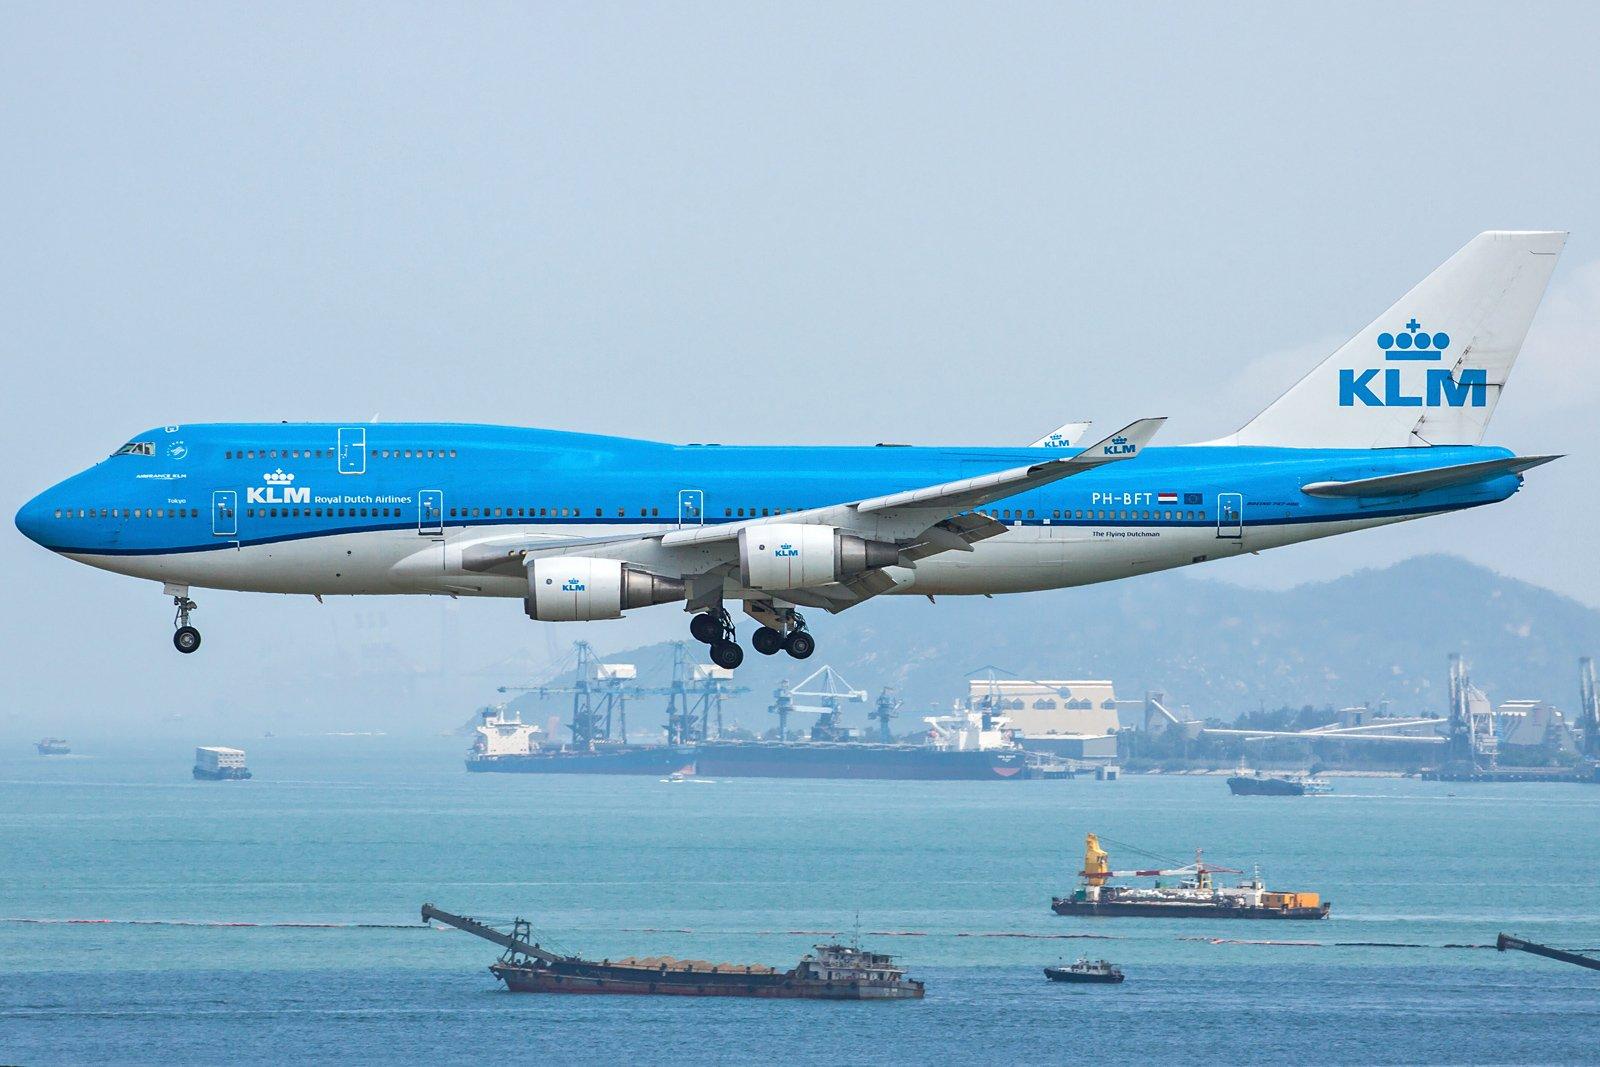 KLM Royal Dutch Airlines Boeing 747-406(M) PH-BFT